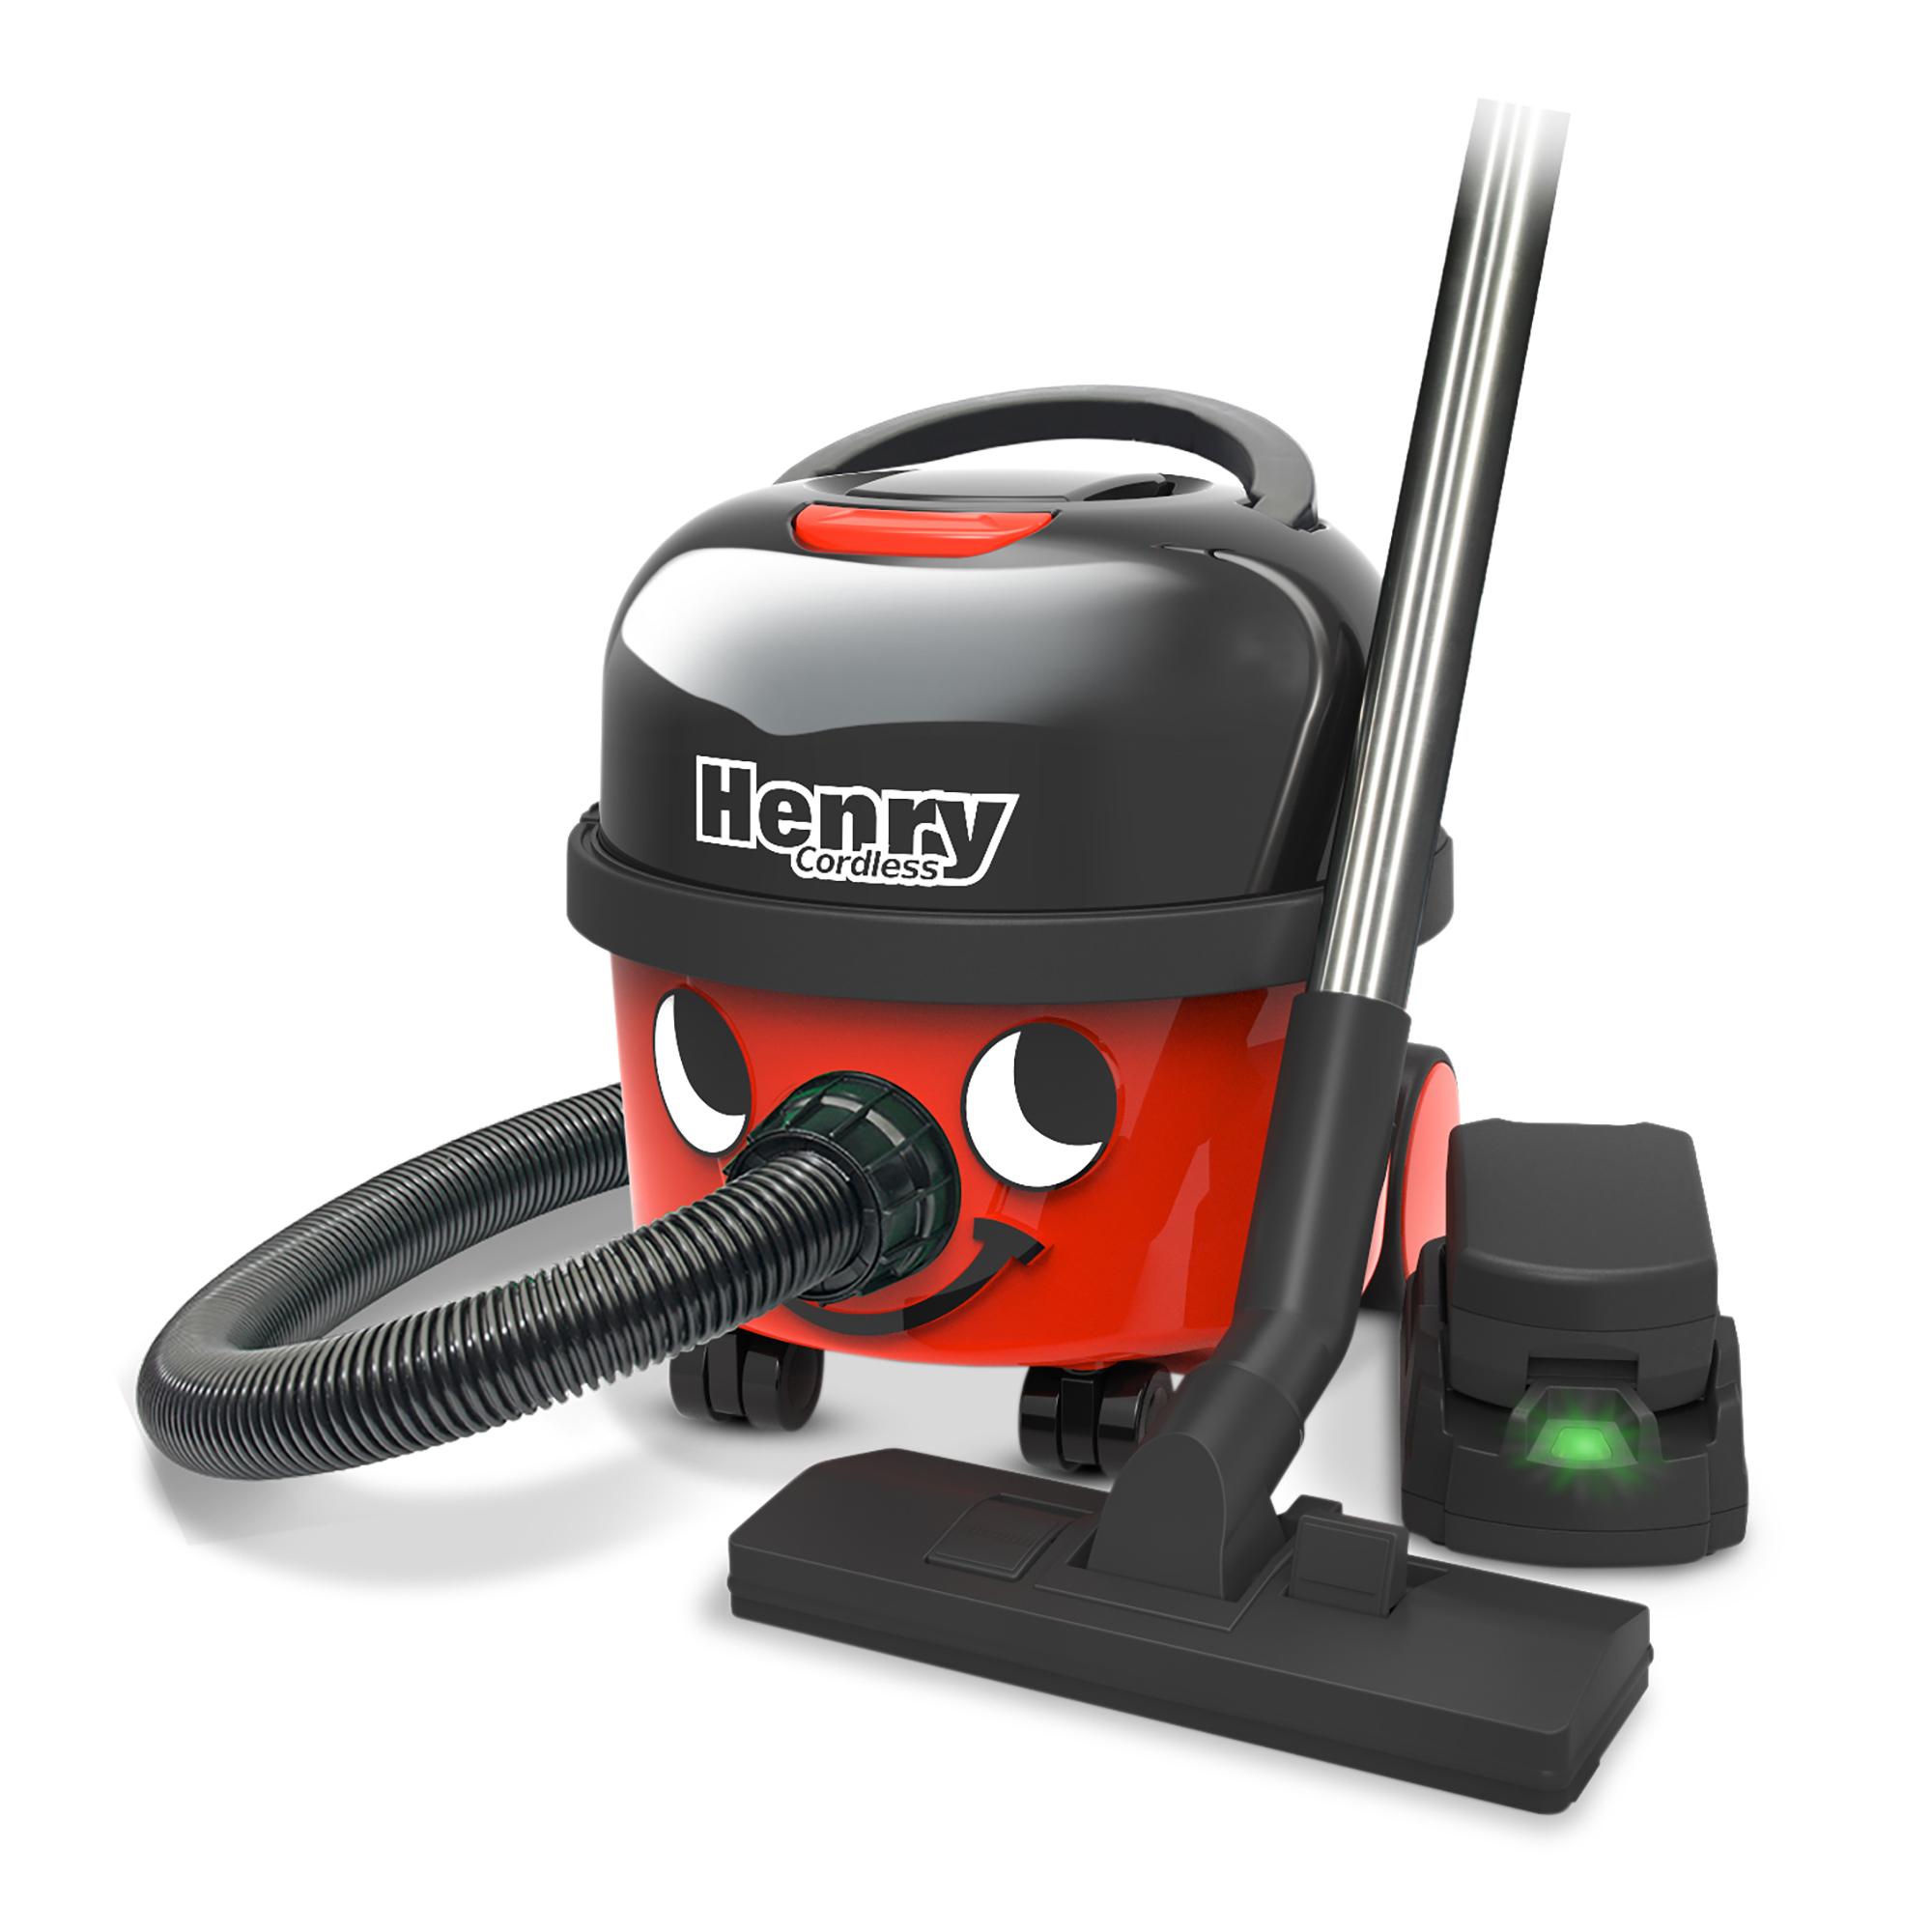 Numatic Cordless Henry Vacuum Cleaner 250W 6 Litre Capacity HVB160 Ref 907226